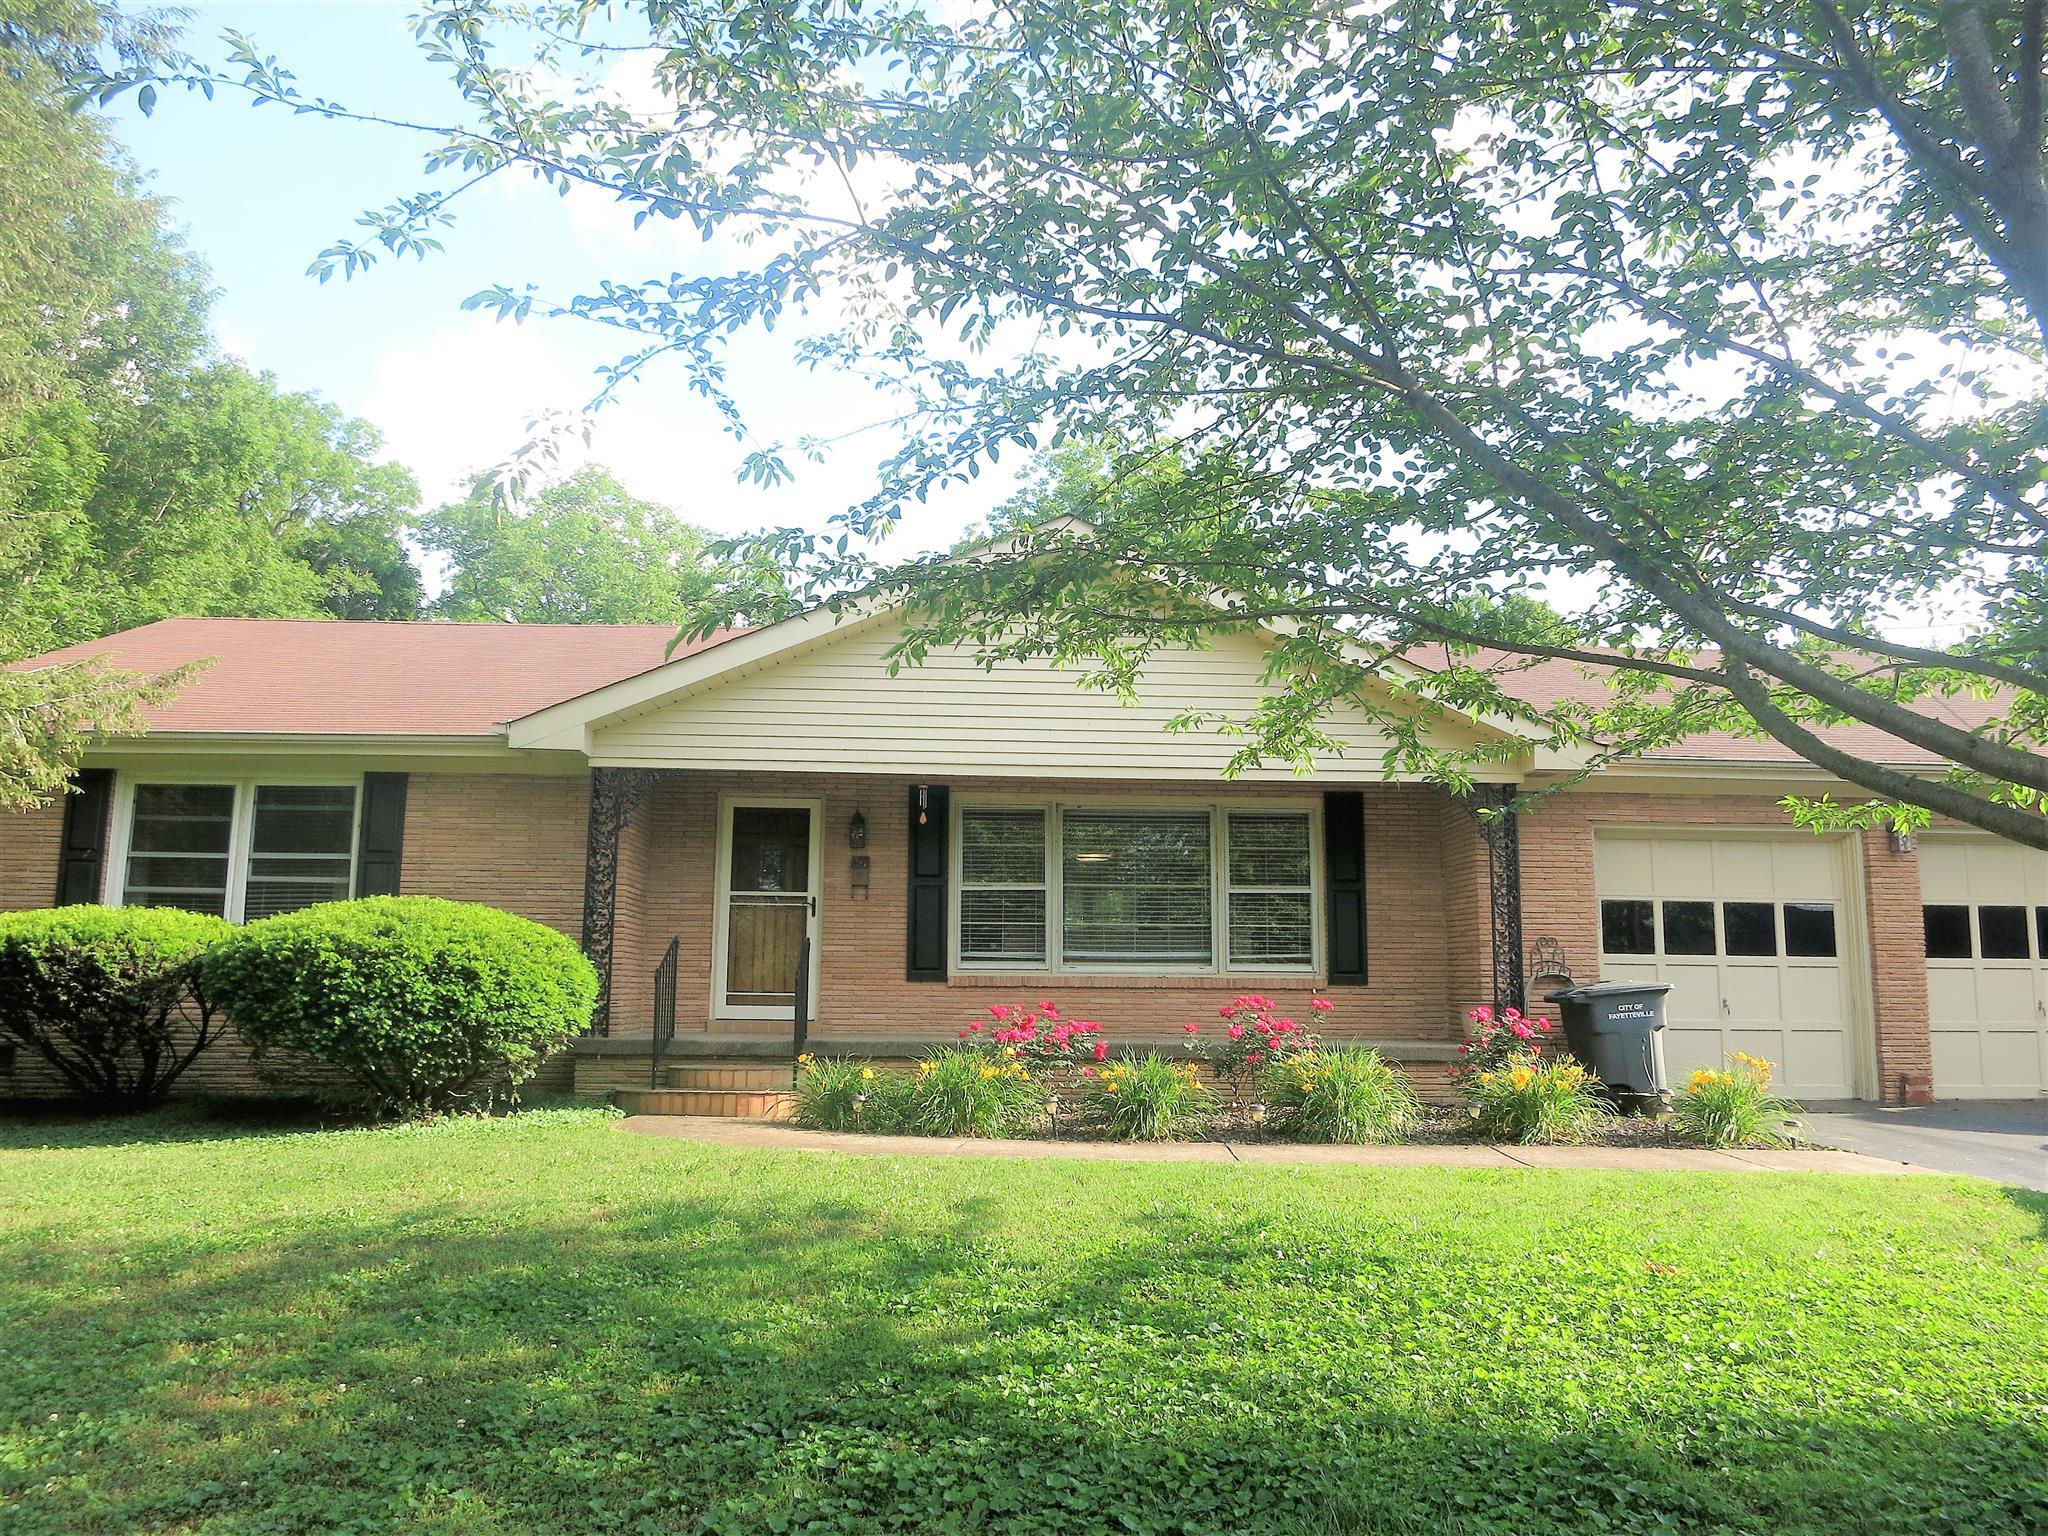 Photo of 604 Swanson Blvd  Fayetteville  TN